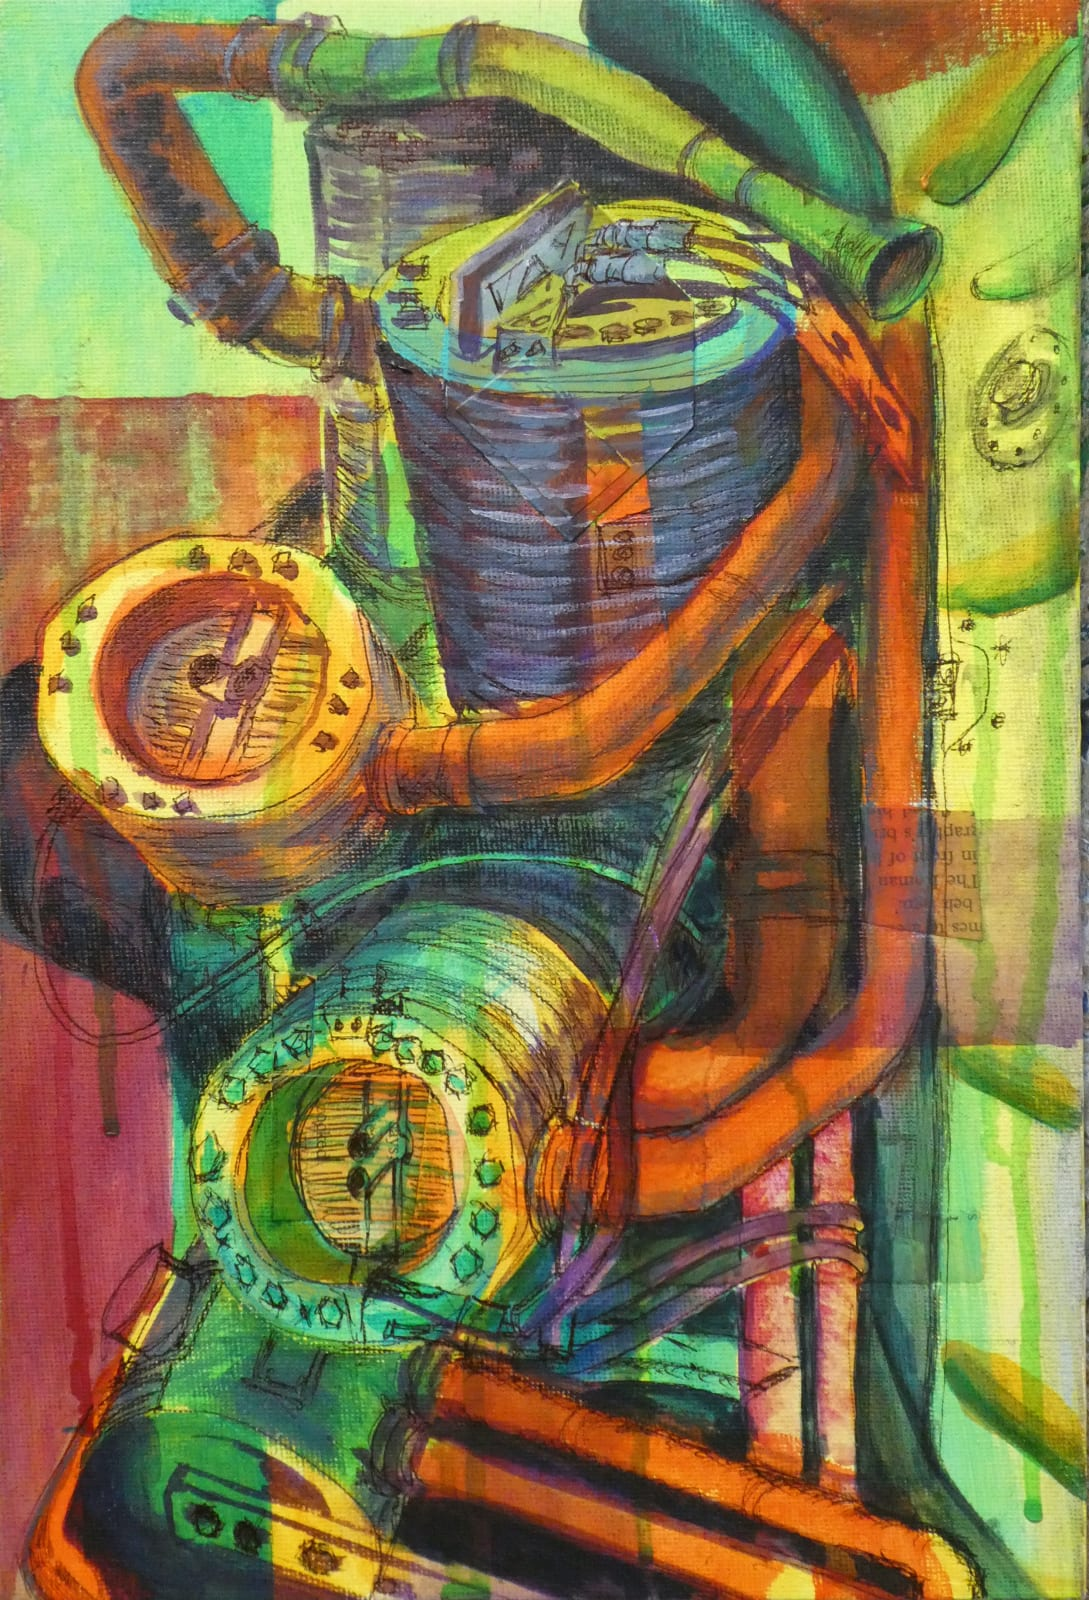 John Hamilton, Radiant Engine